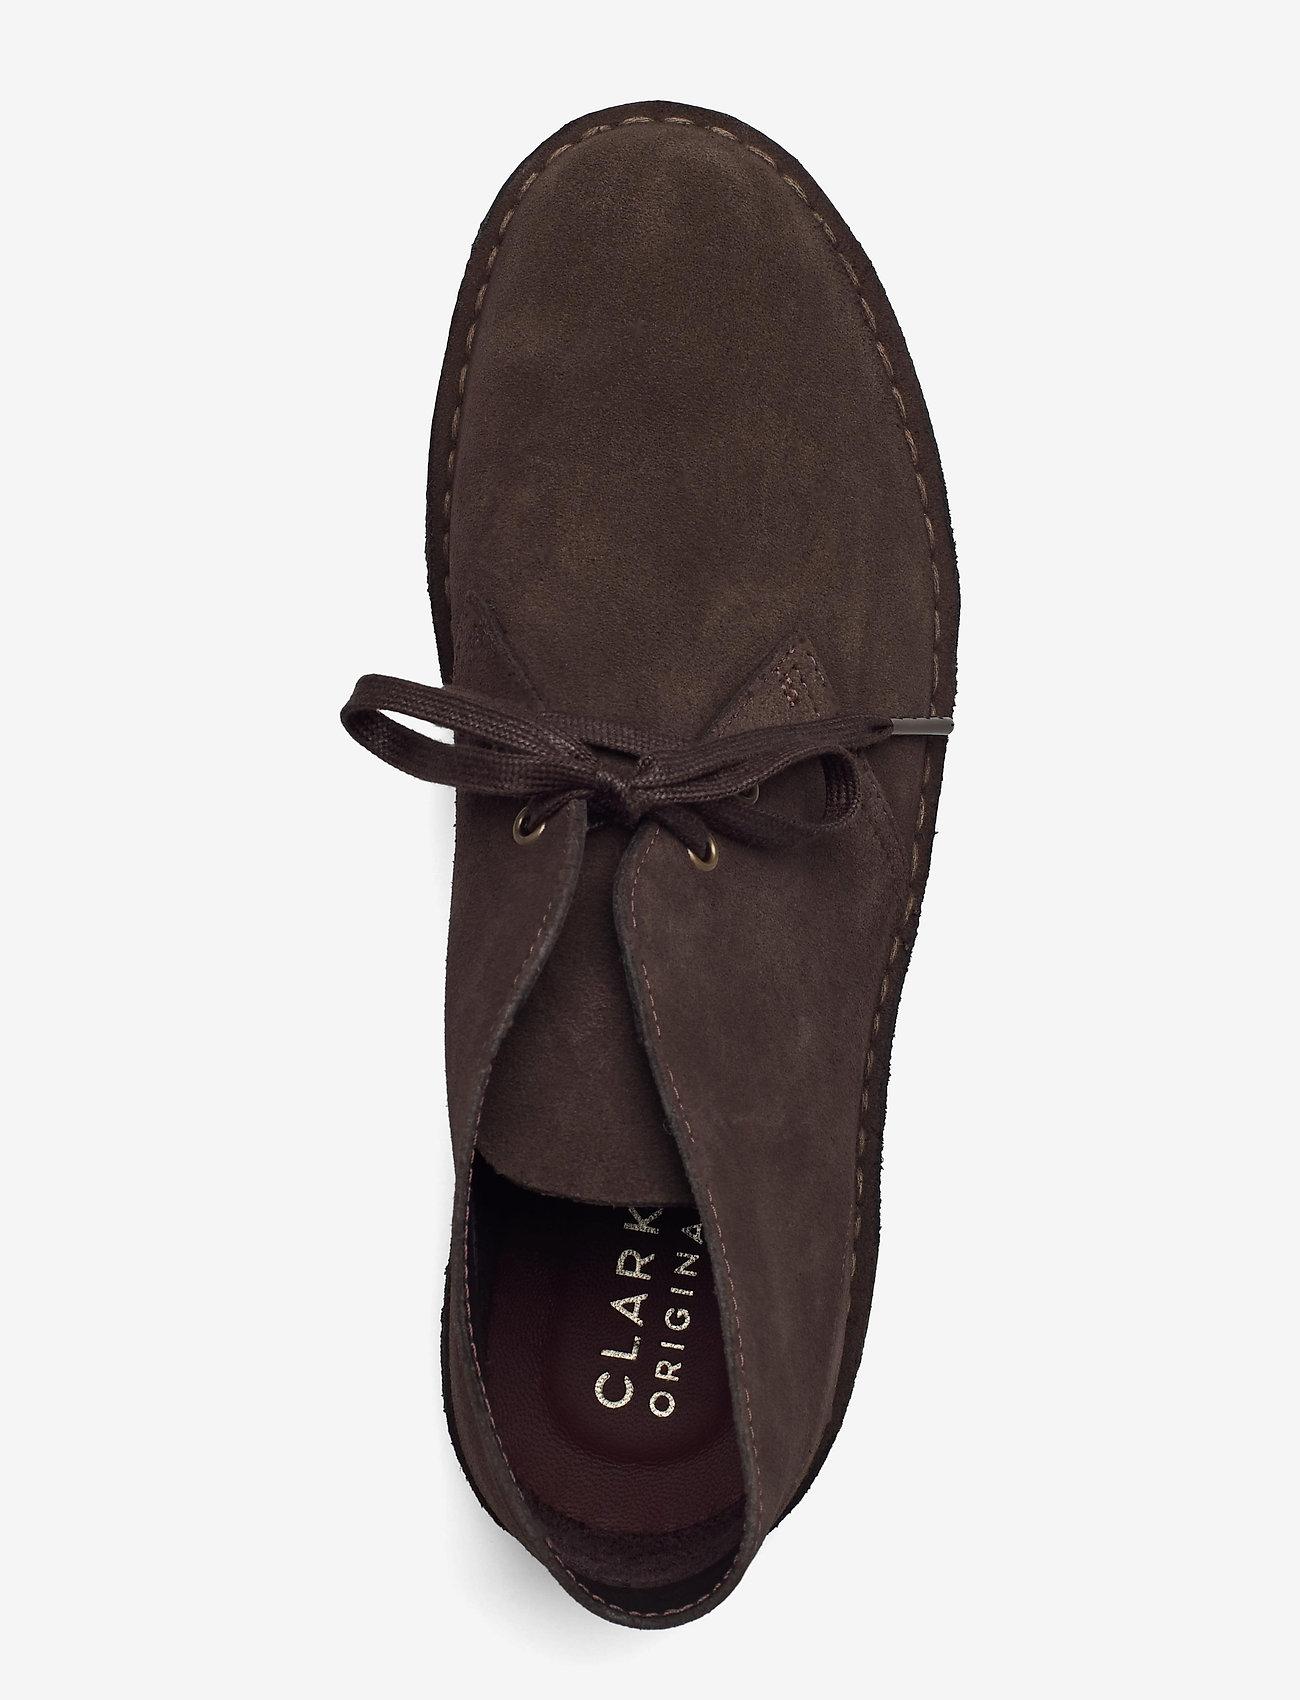 Clarks Originals - Desert Boot - Ökenkängor - brown sde - 3